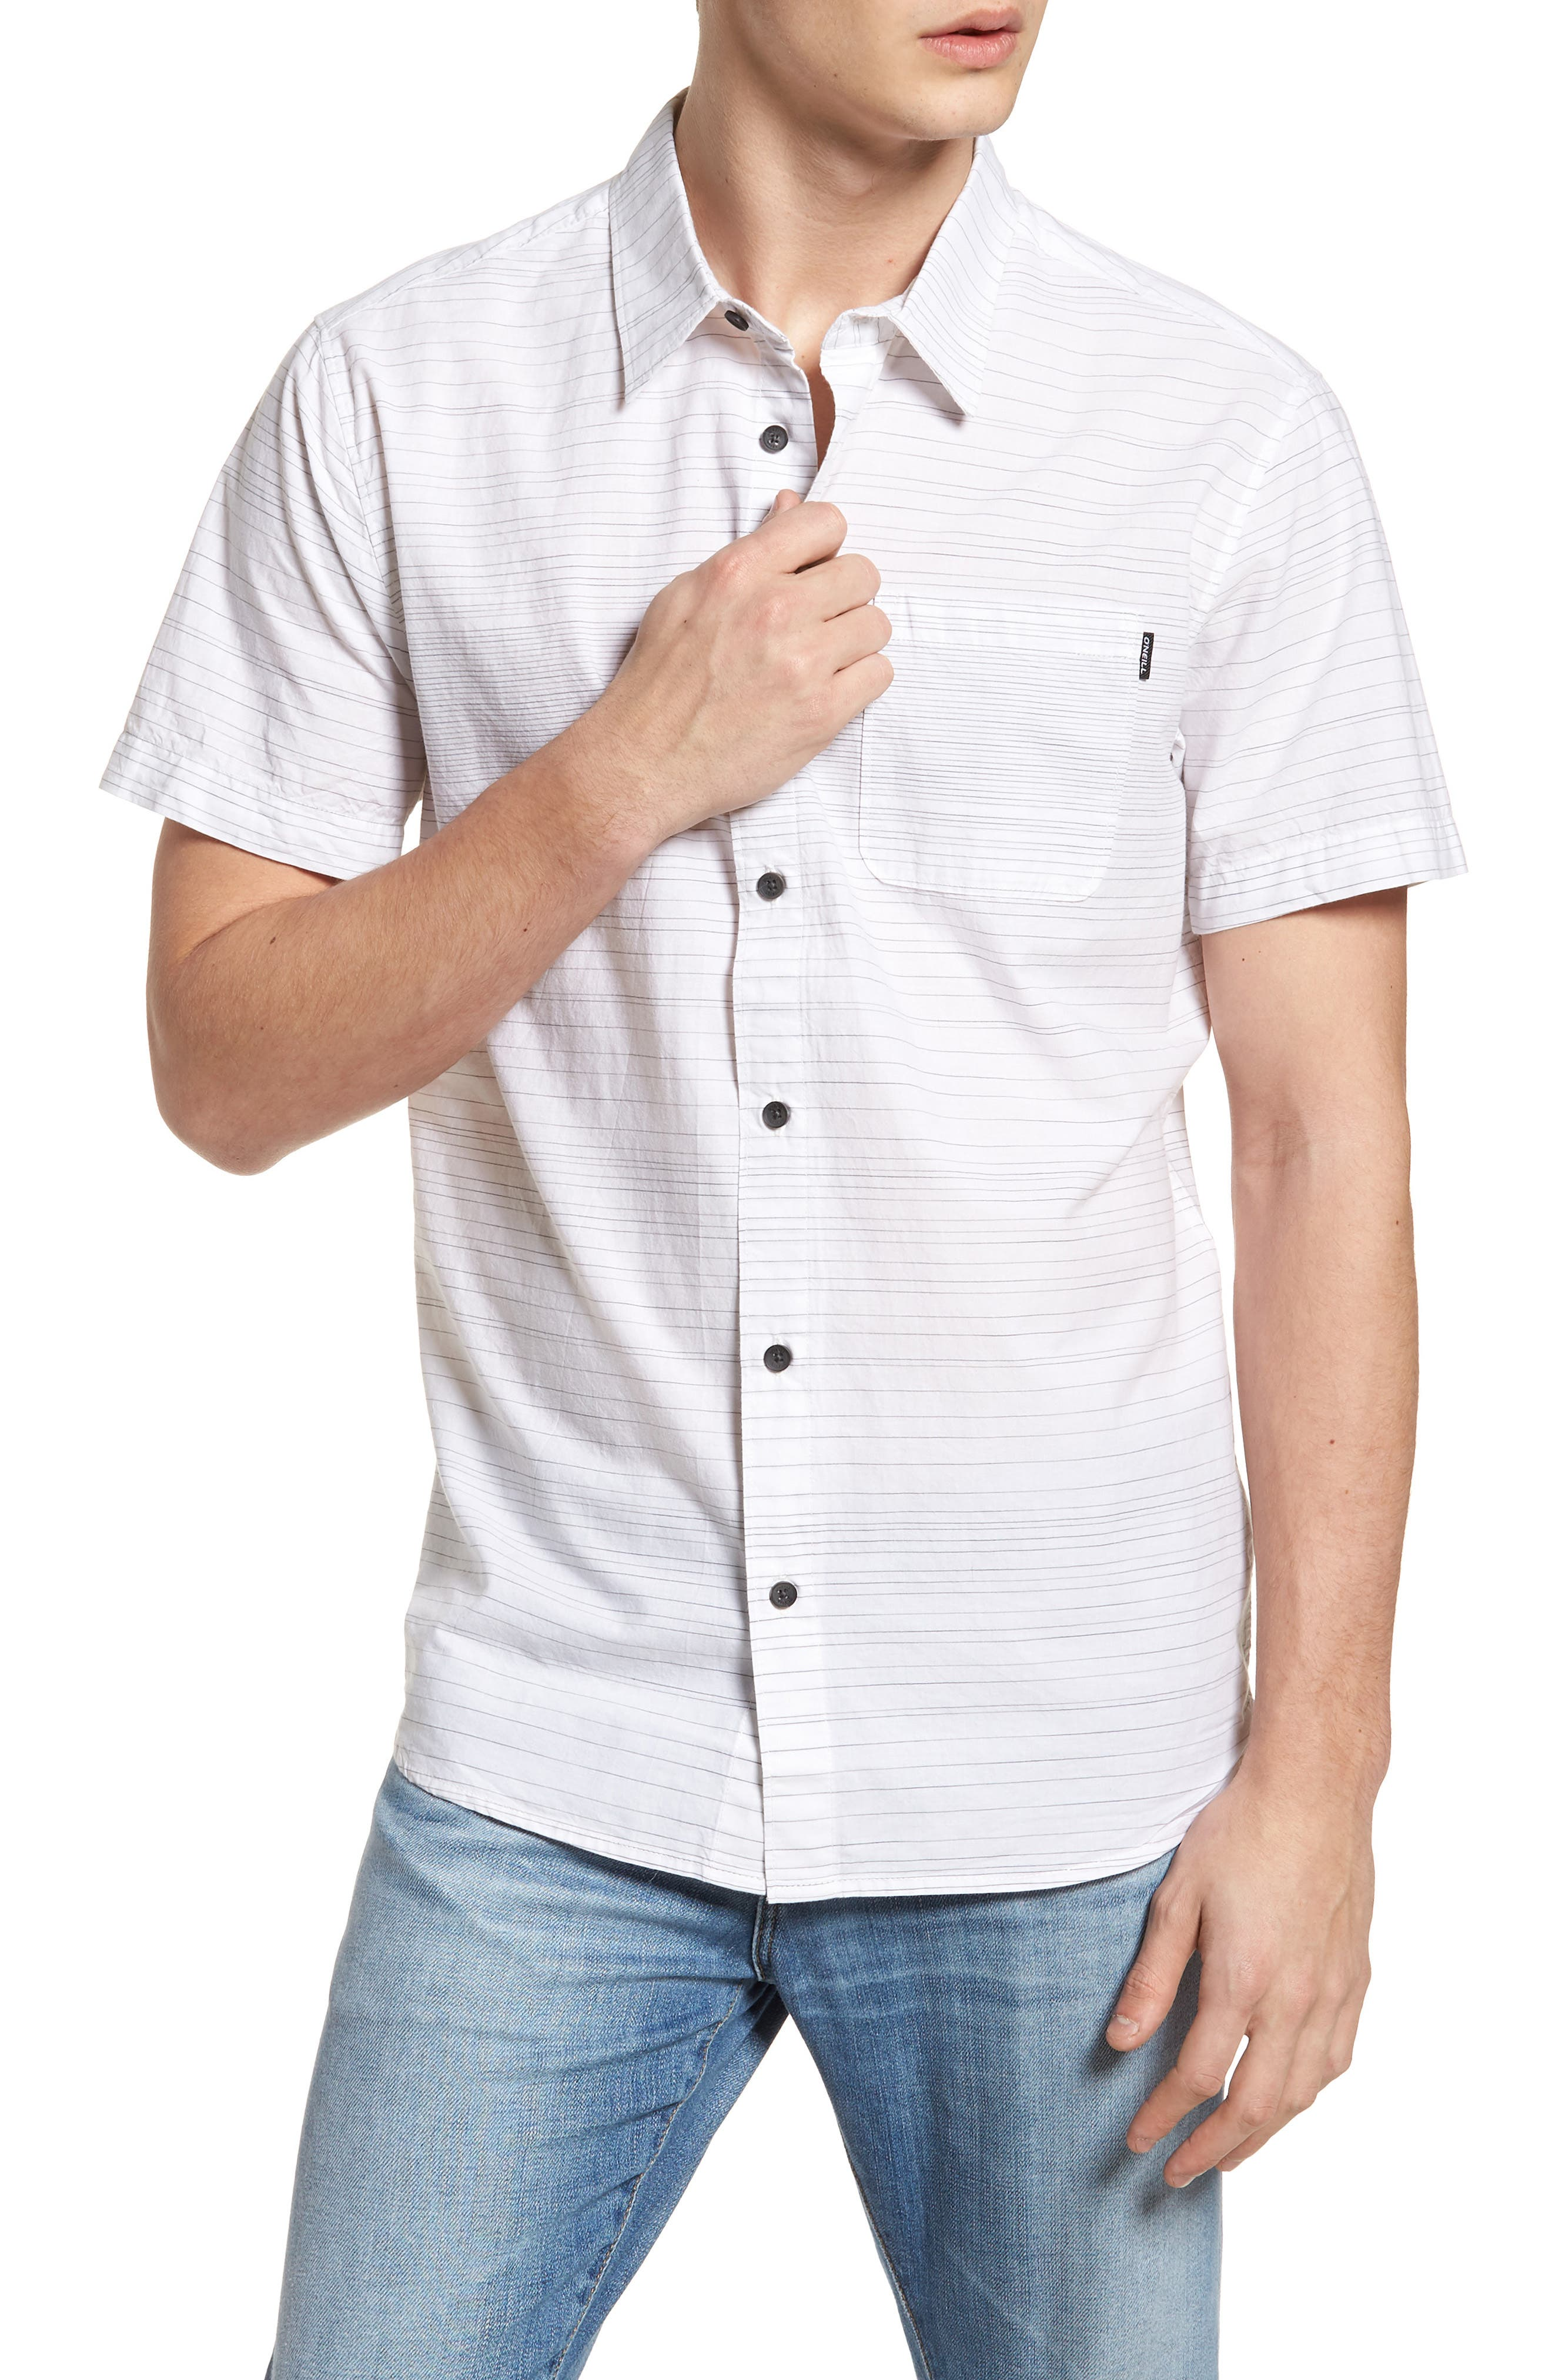 Hound Woven Shirt,                             Main thumbnail 1, color,                             White